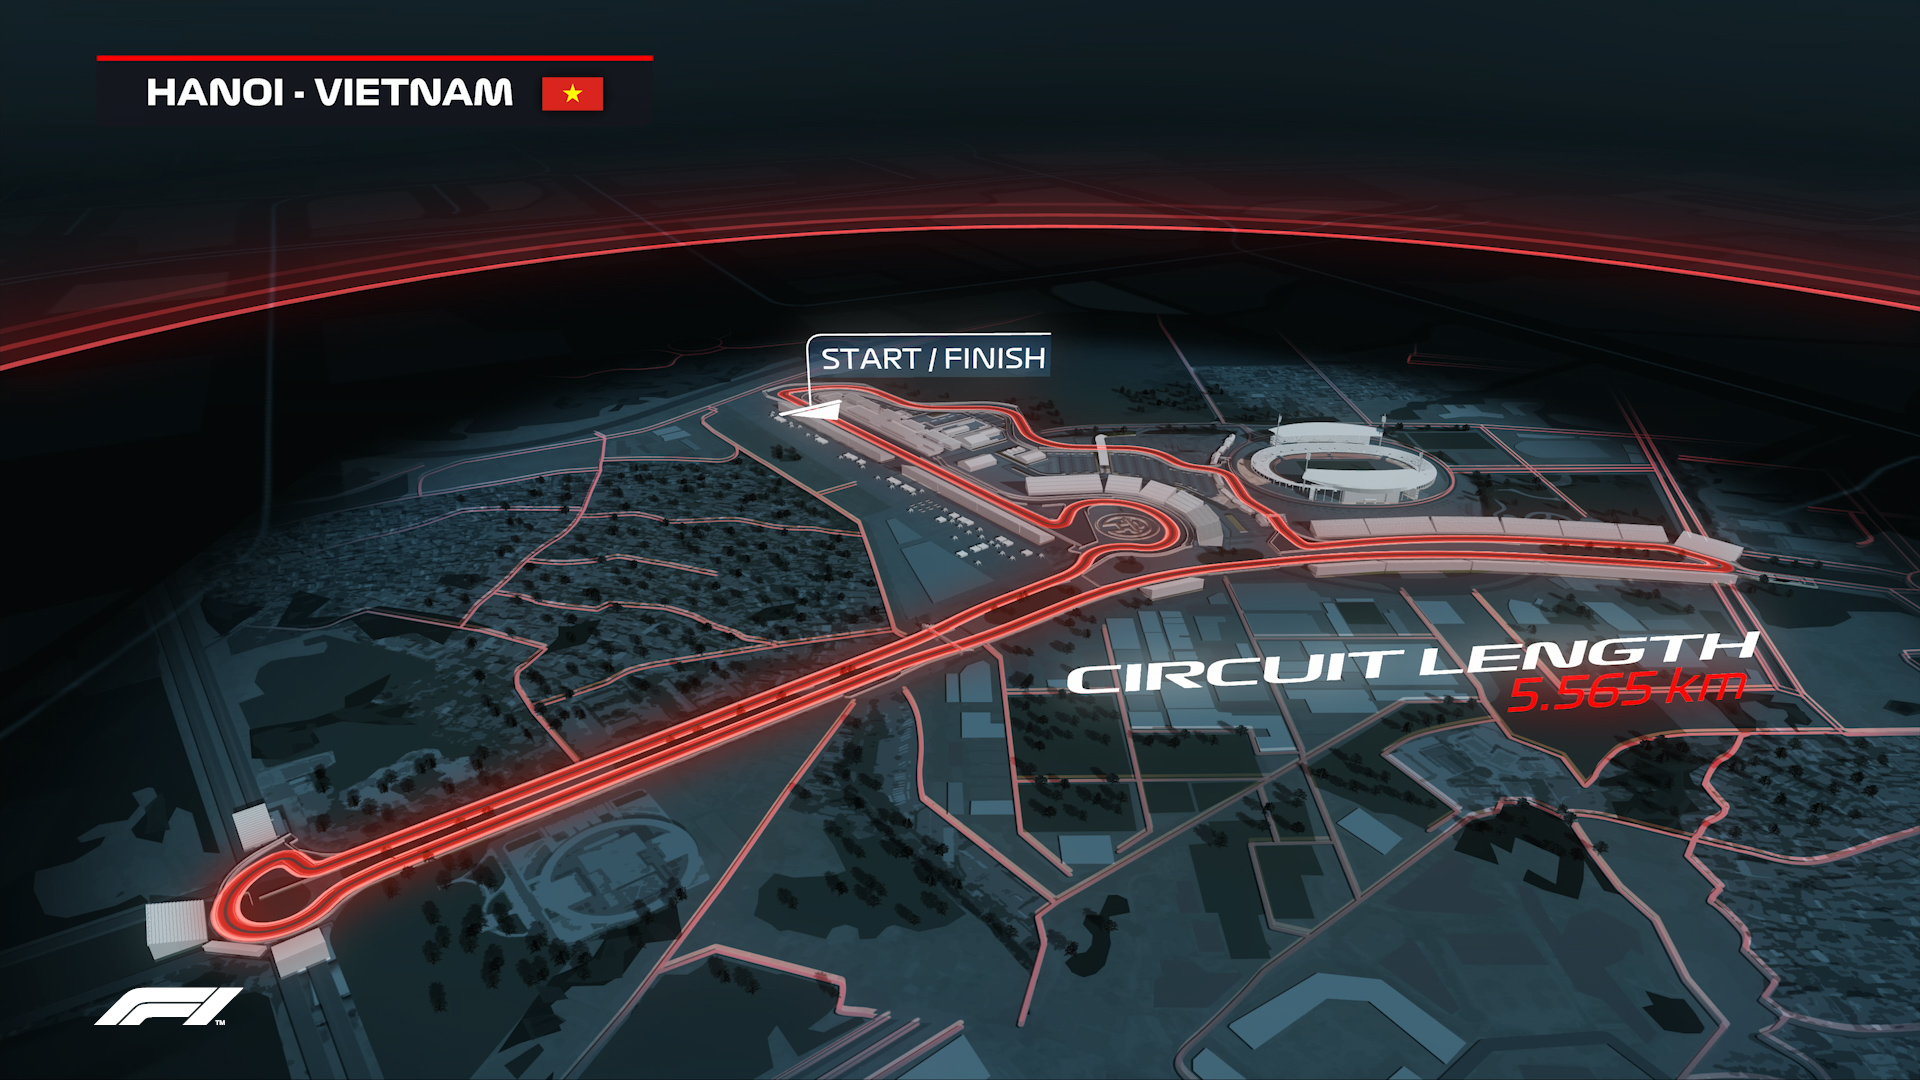 Vietnam Grand Prix 2020: F1 breaks ground in Hanoi ahead of new street race